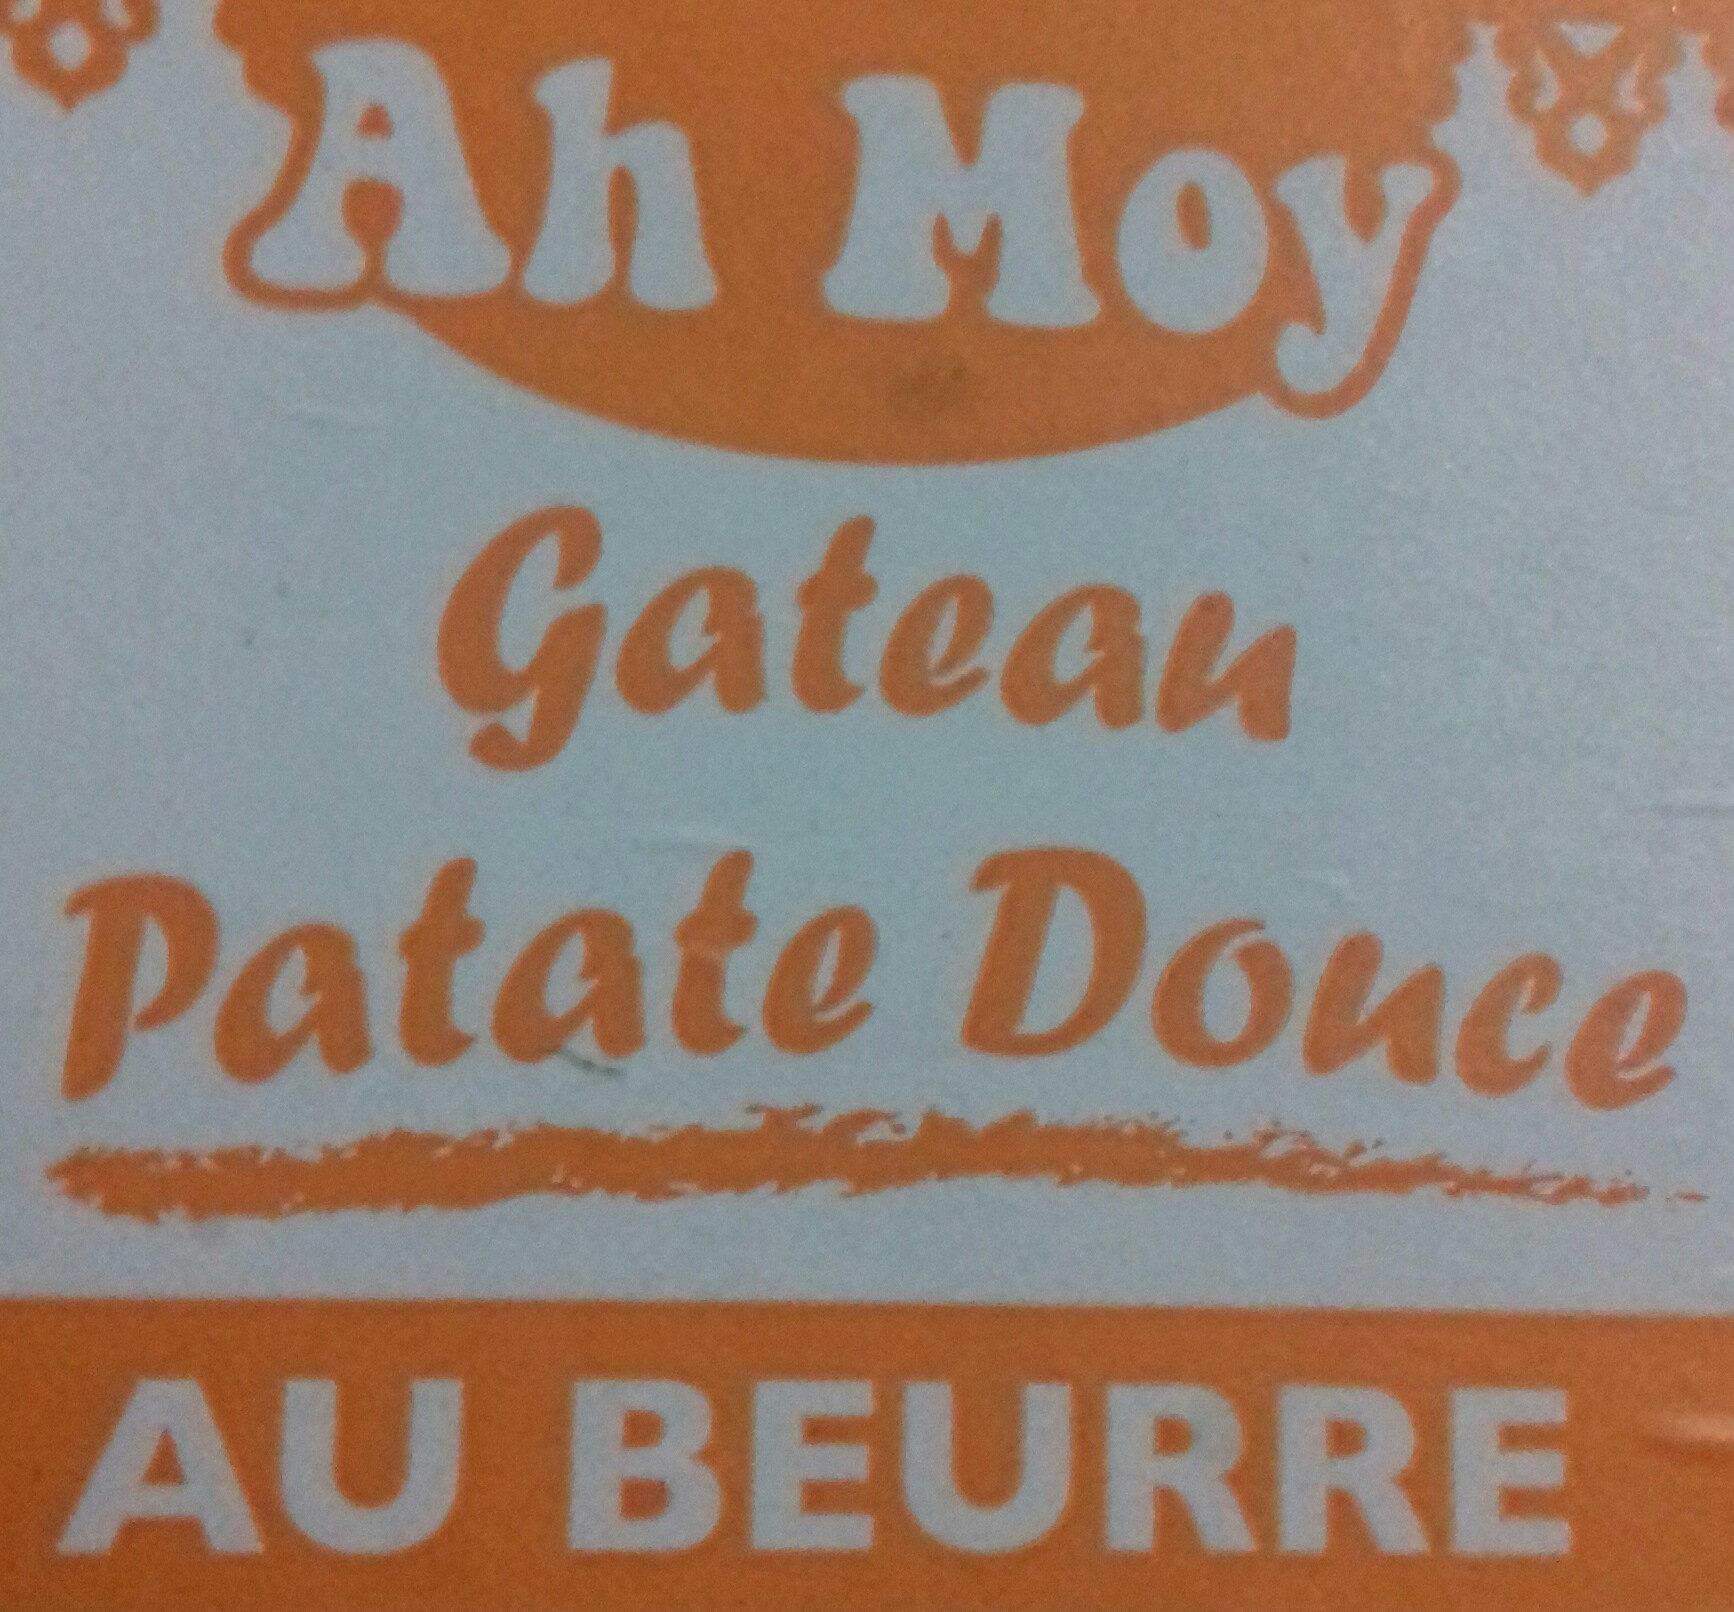 Gâteau patate douce - Product - fr